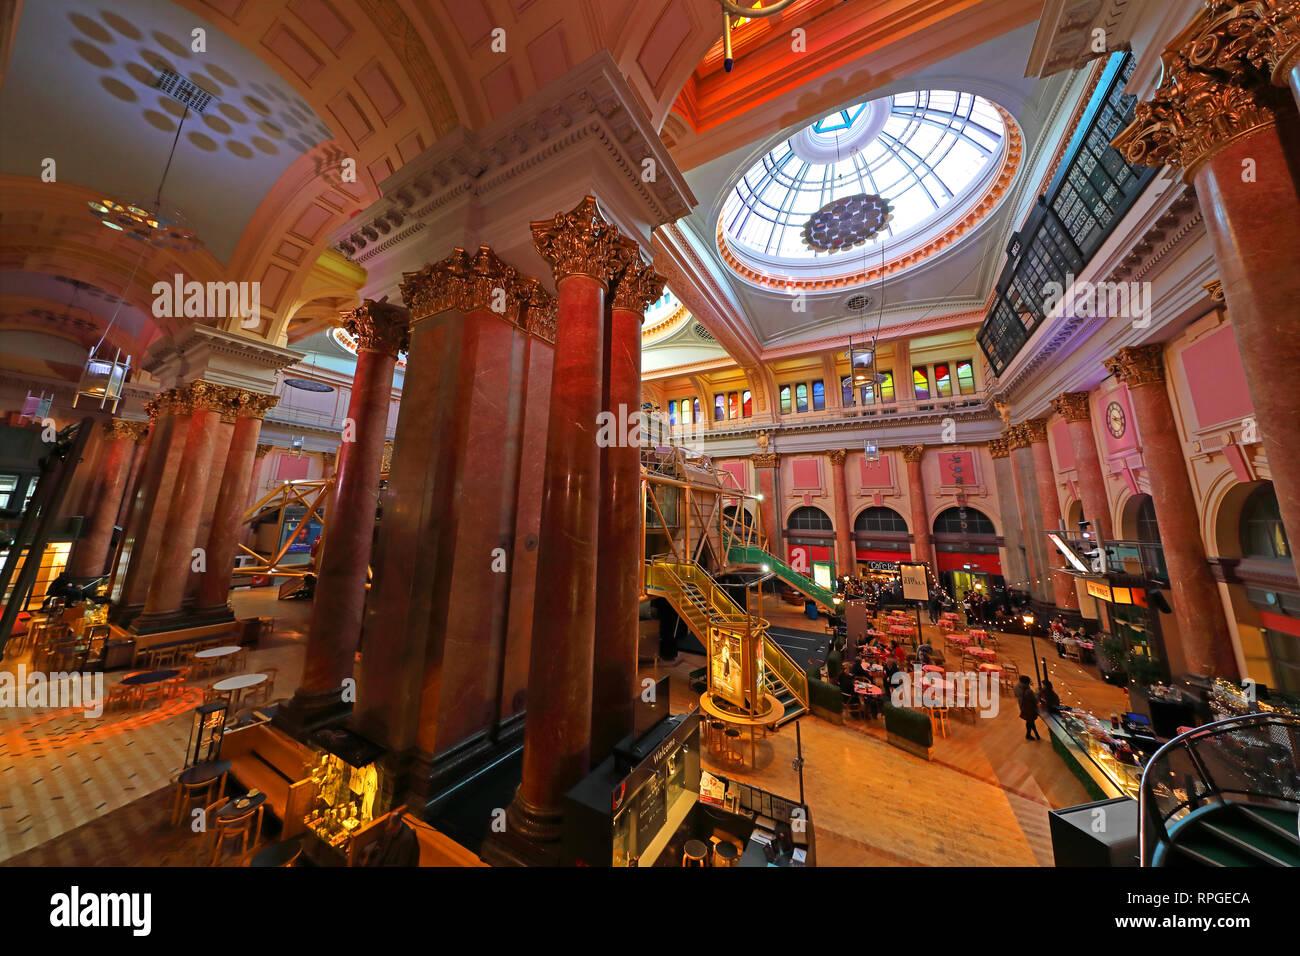 HotpixUK,@HotpixUK,England,UK,GB,City